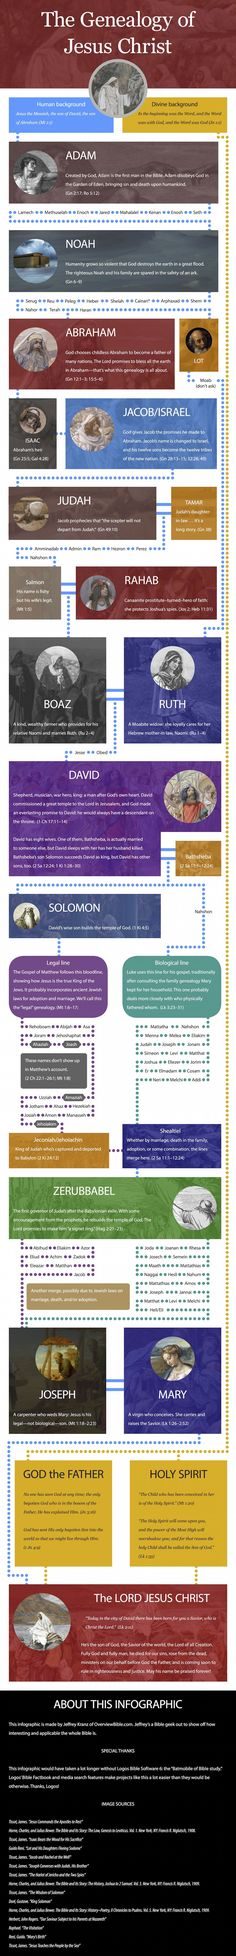 Who is sugar bear hookup pictures genealogy of jesus